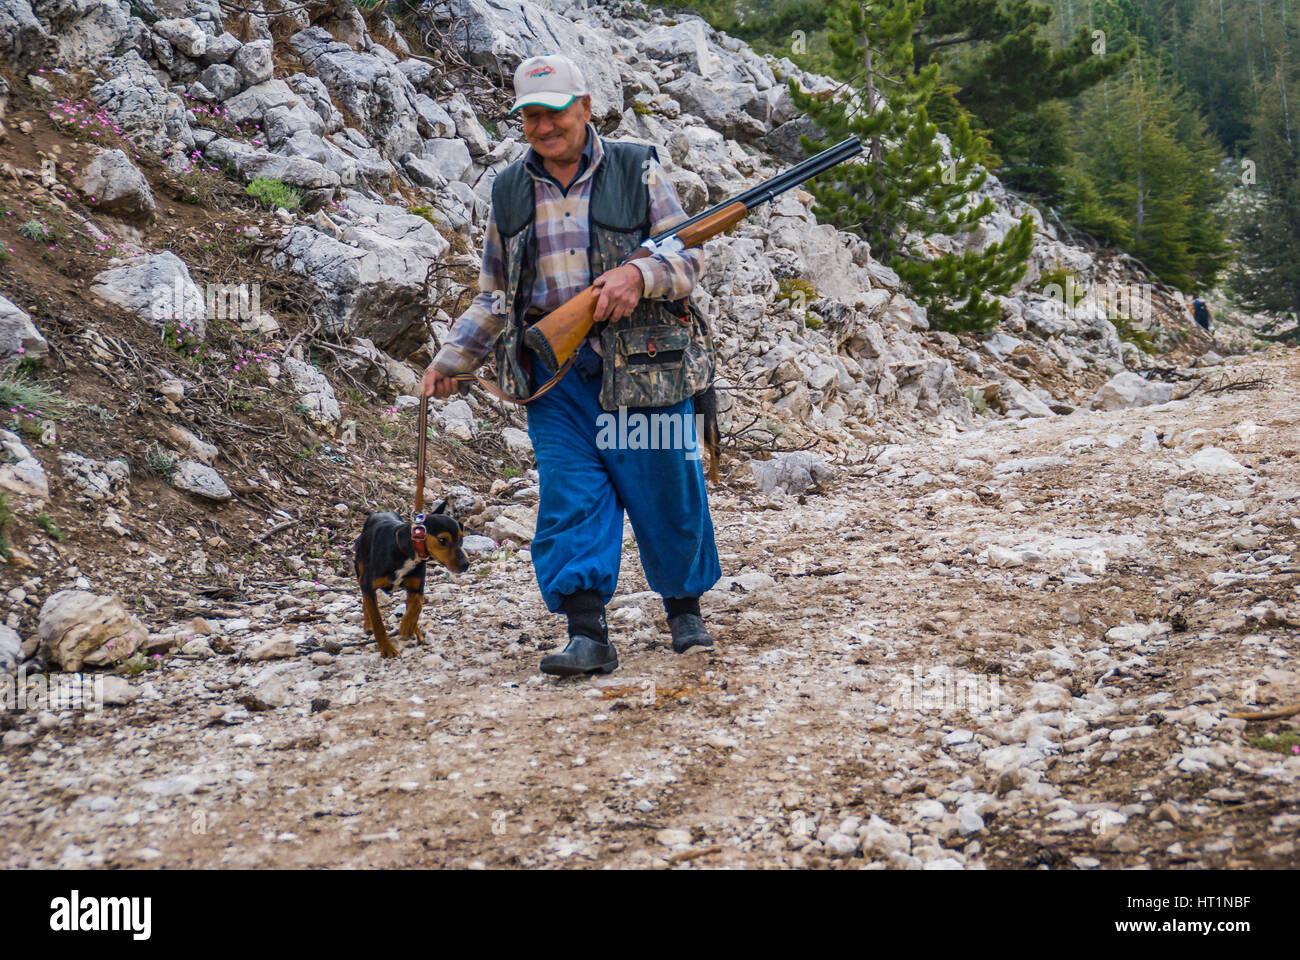 hunter with his dog and gun hunting - Stock Image